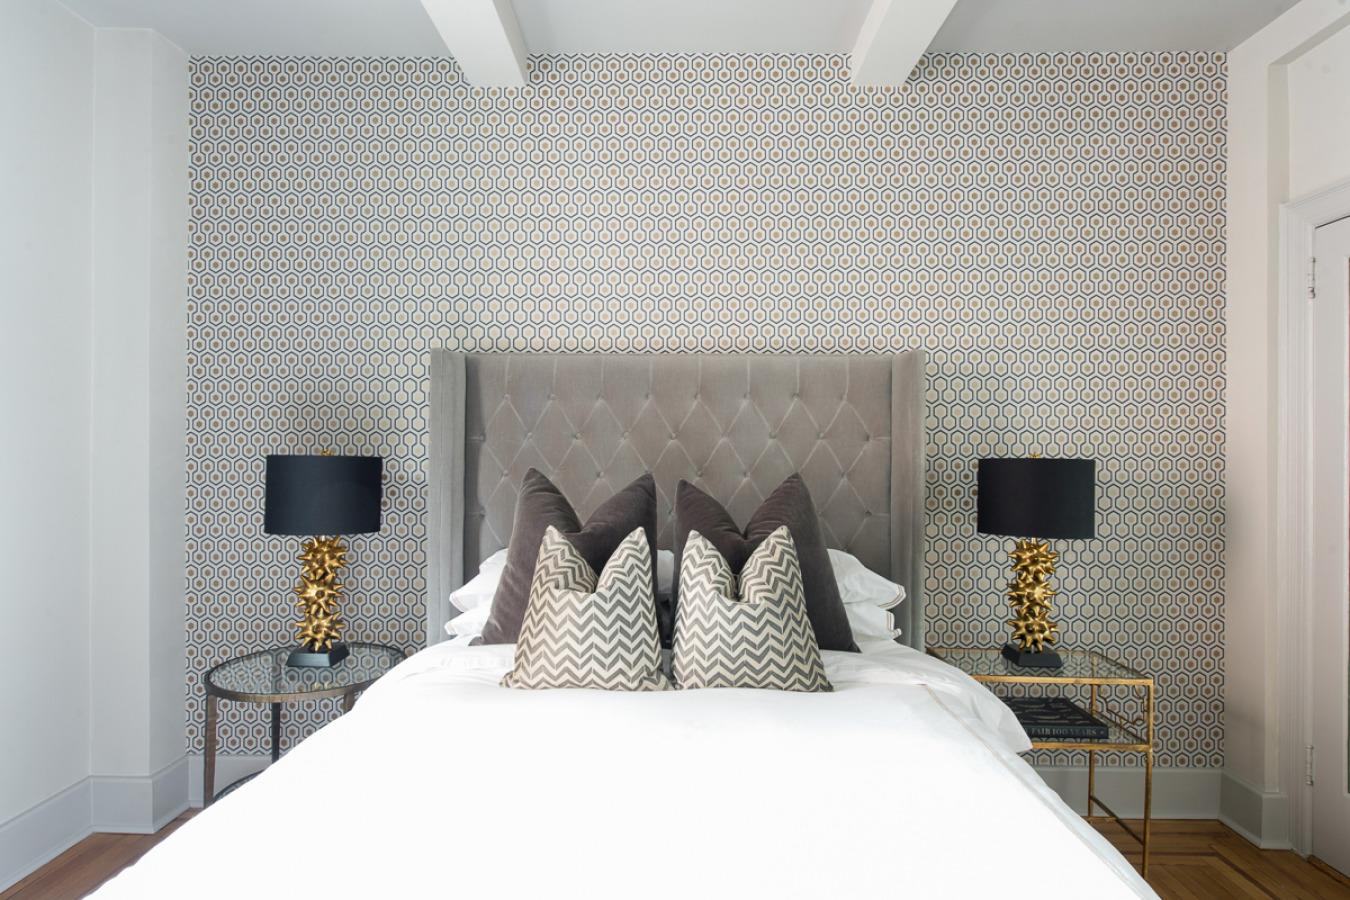 Homepolish-12230-interior-inspiration-41ad808e-1350x900.jpeg